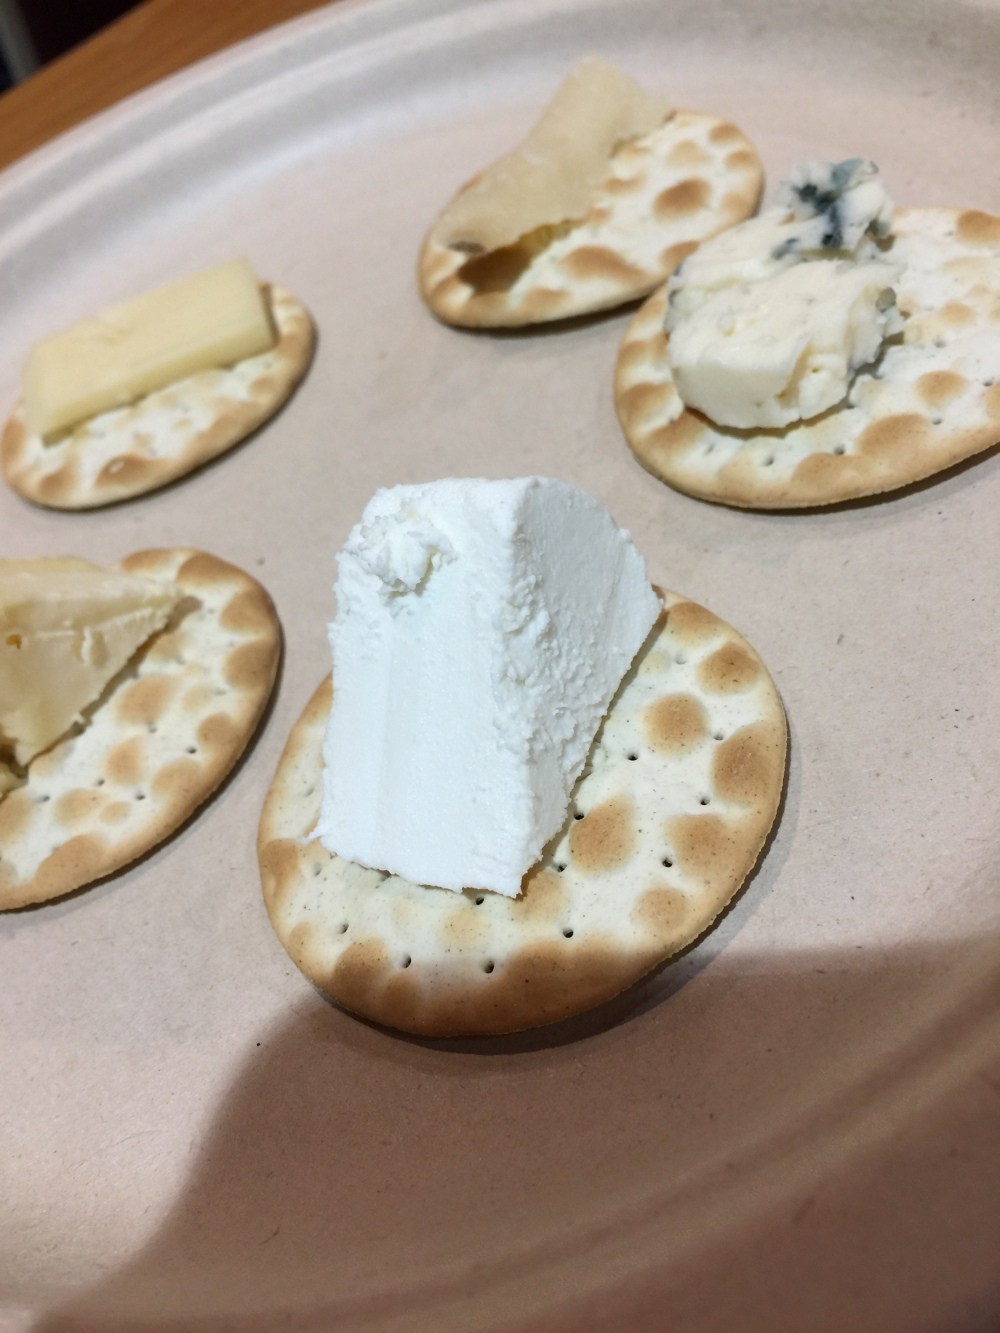 ca-state-fair-food-experience-class-cheese-072018 (4)